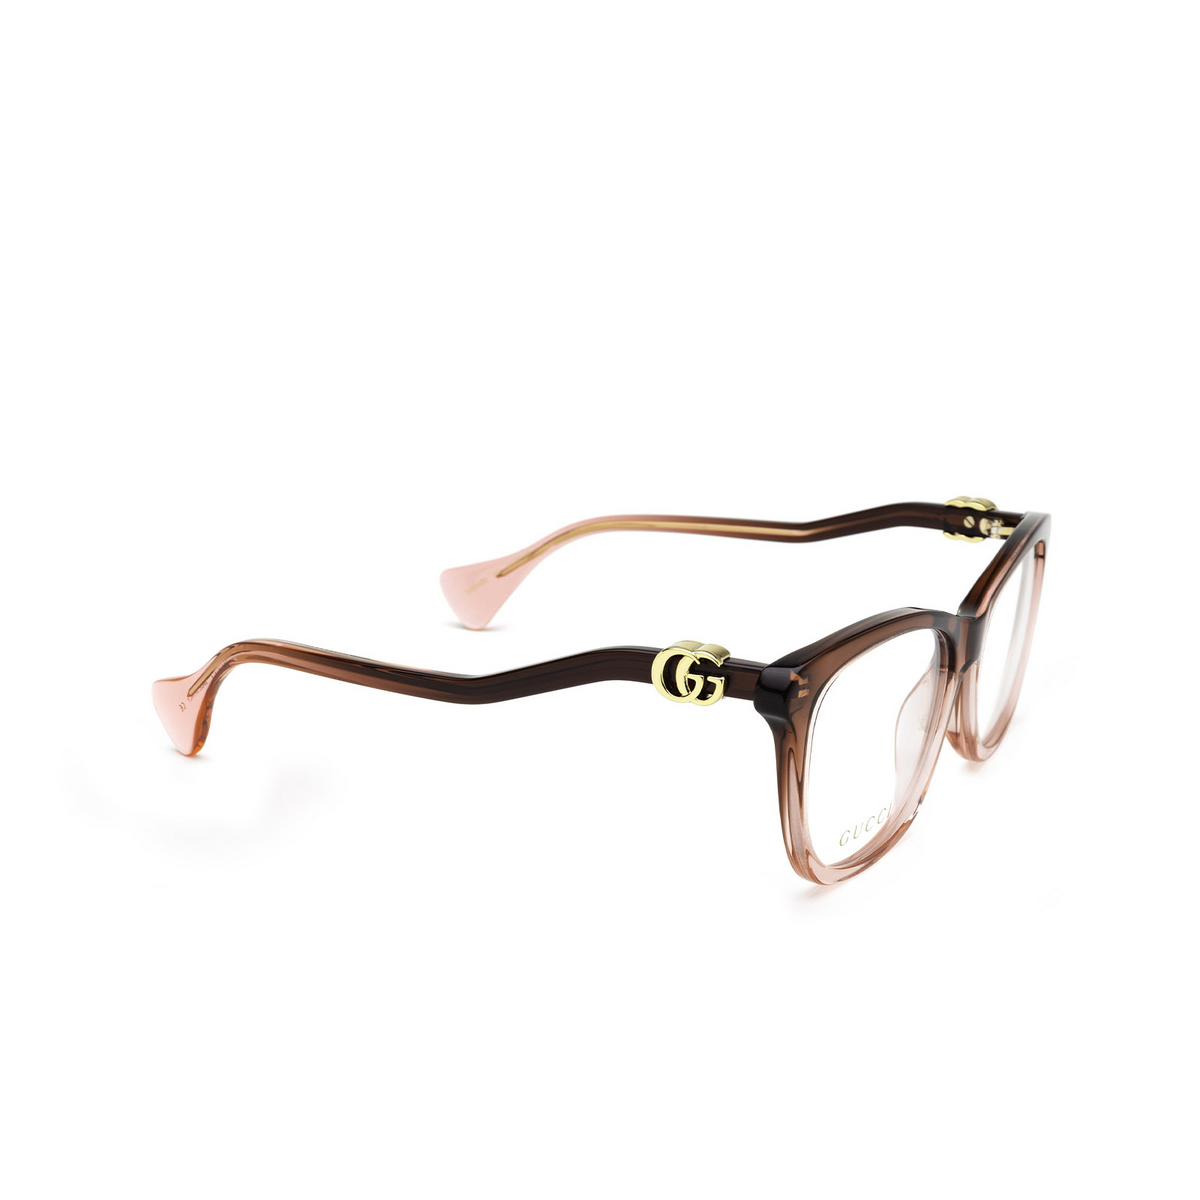 Gucci® Cat-eye Eyeglasses: GG1012O color Burgundy & Pink 003 - three-quarters view.